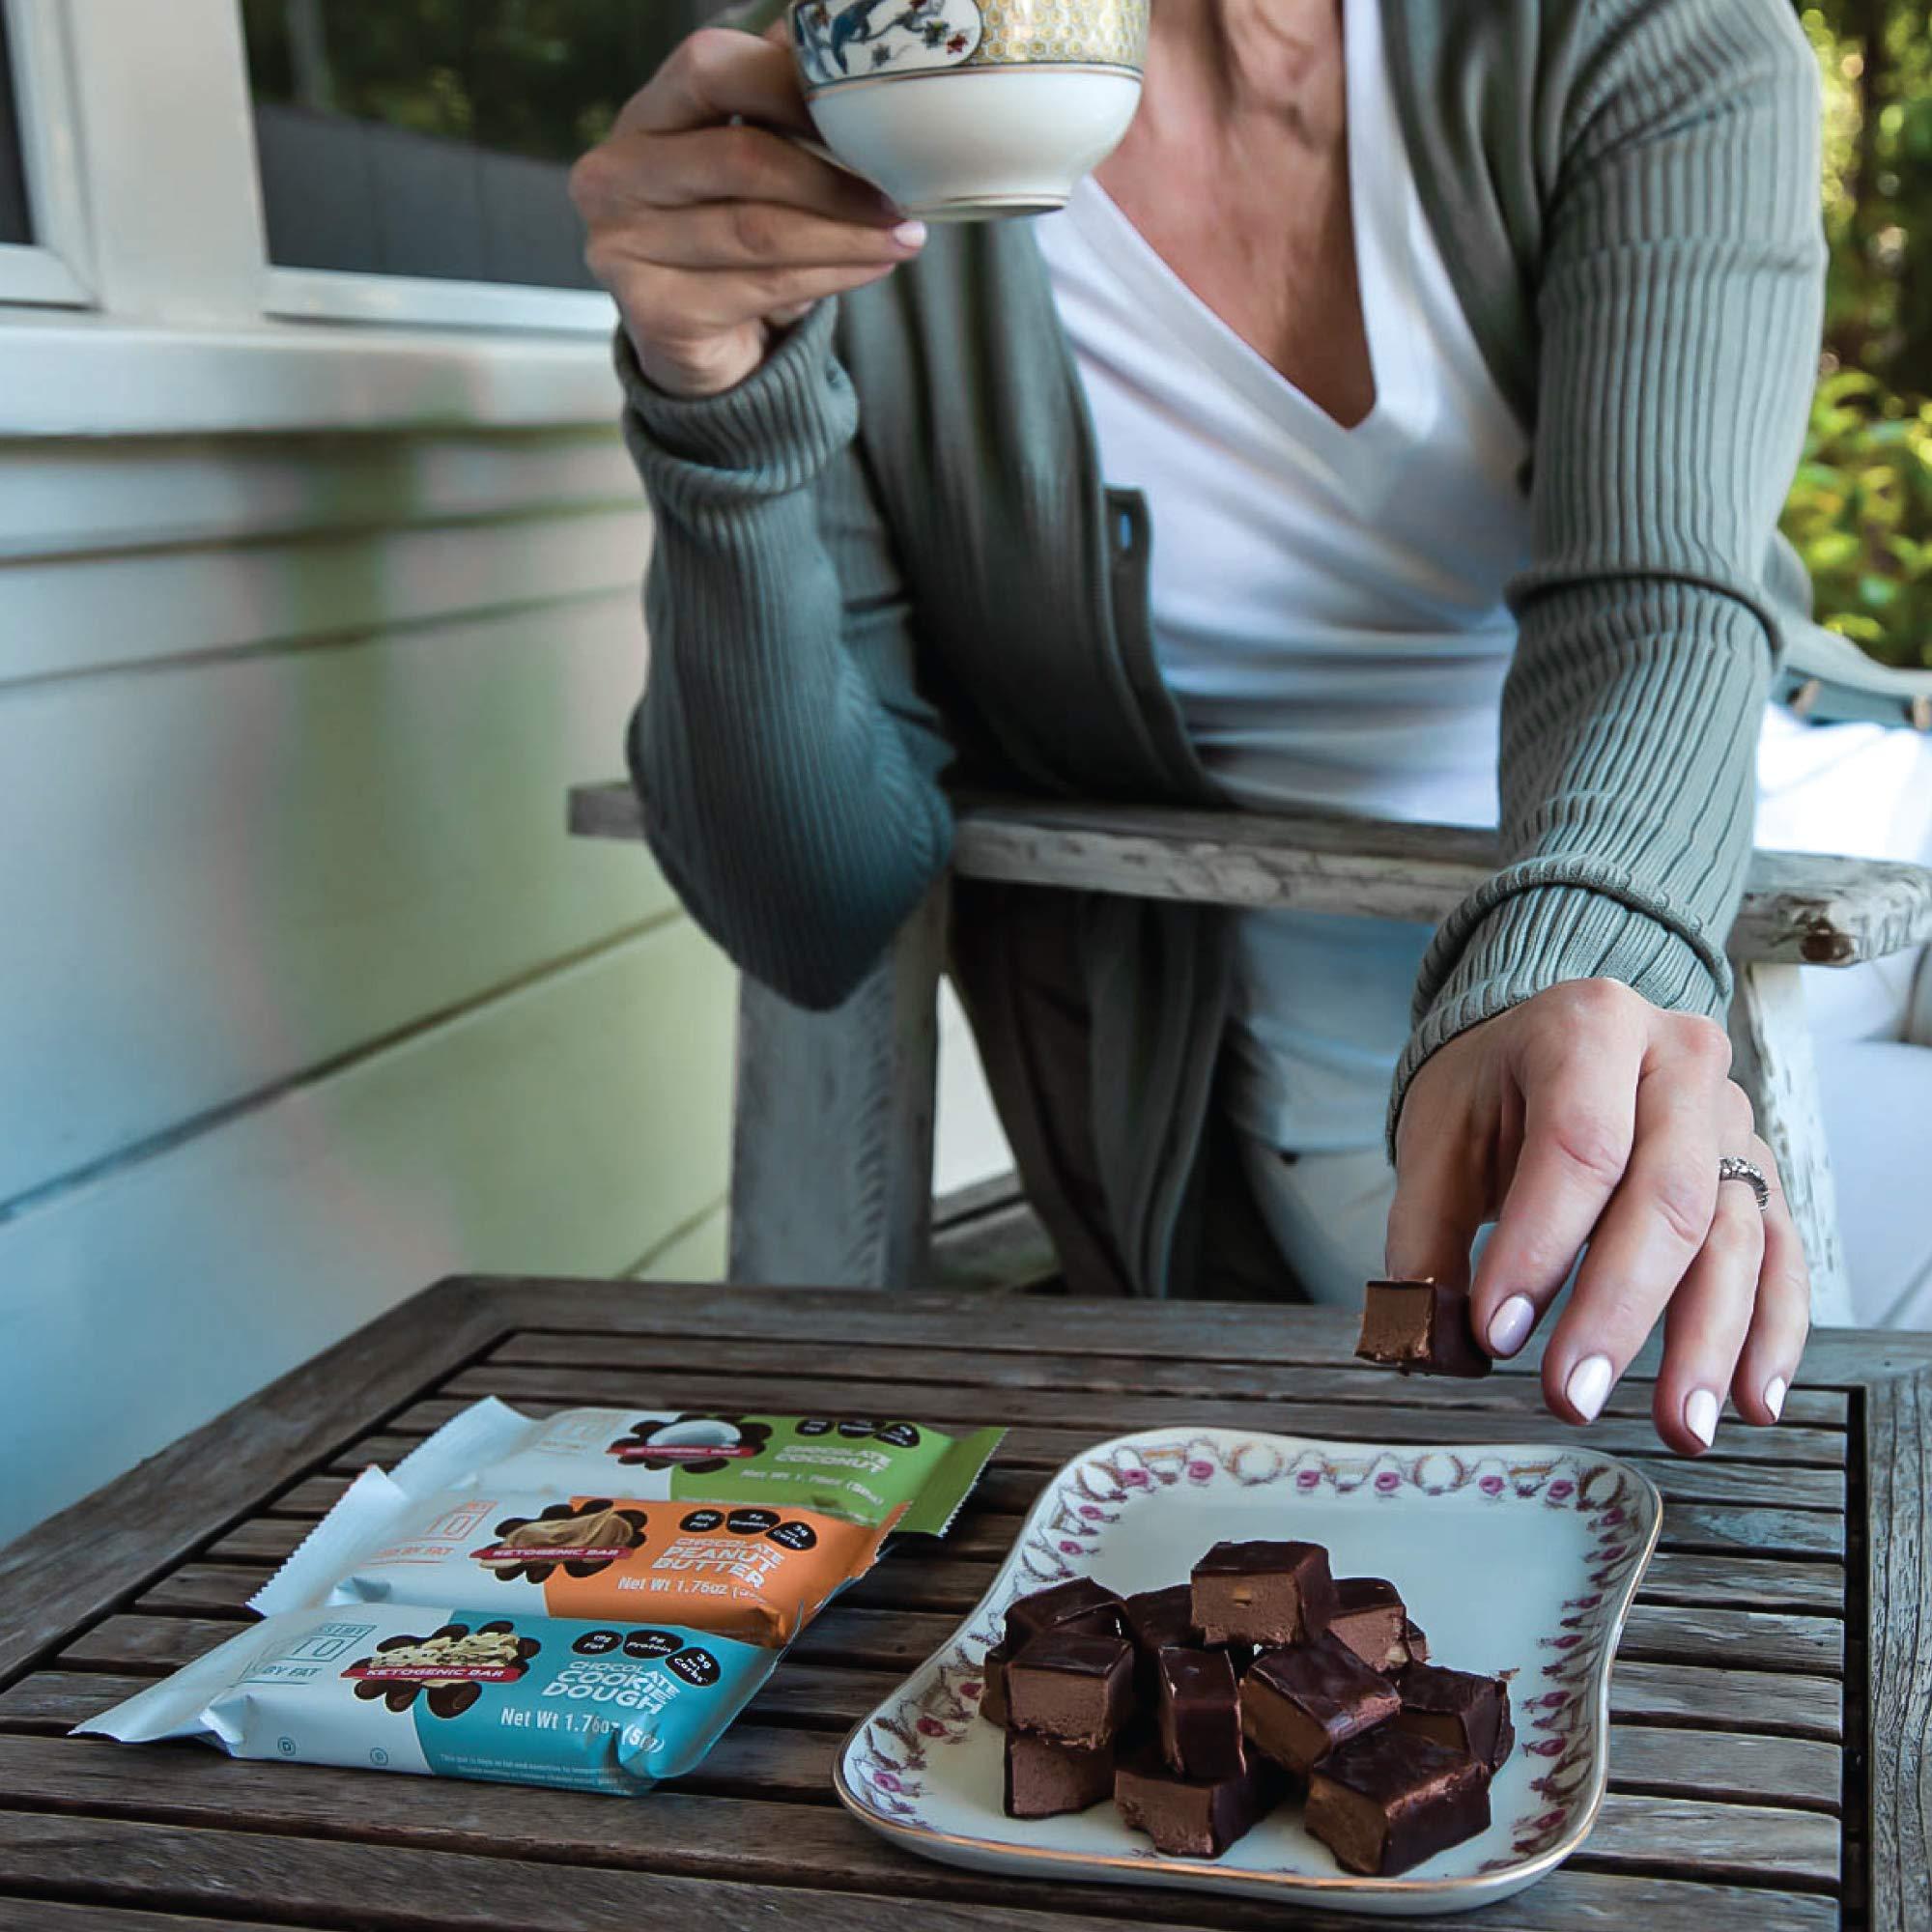 Kiss My Keto Snacks Keto Bars - Keto Chocolate Variety (3 Pack, 36 Bars), Nutritional Keto Food Bars, Paleo, Low Carb/Glycemic Keto Friendly Foods, All Natural On-The-Go Snacks, Low Net Carbs by Kiss My Keto (Image #1)